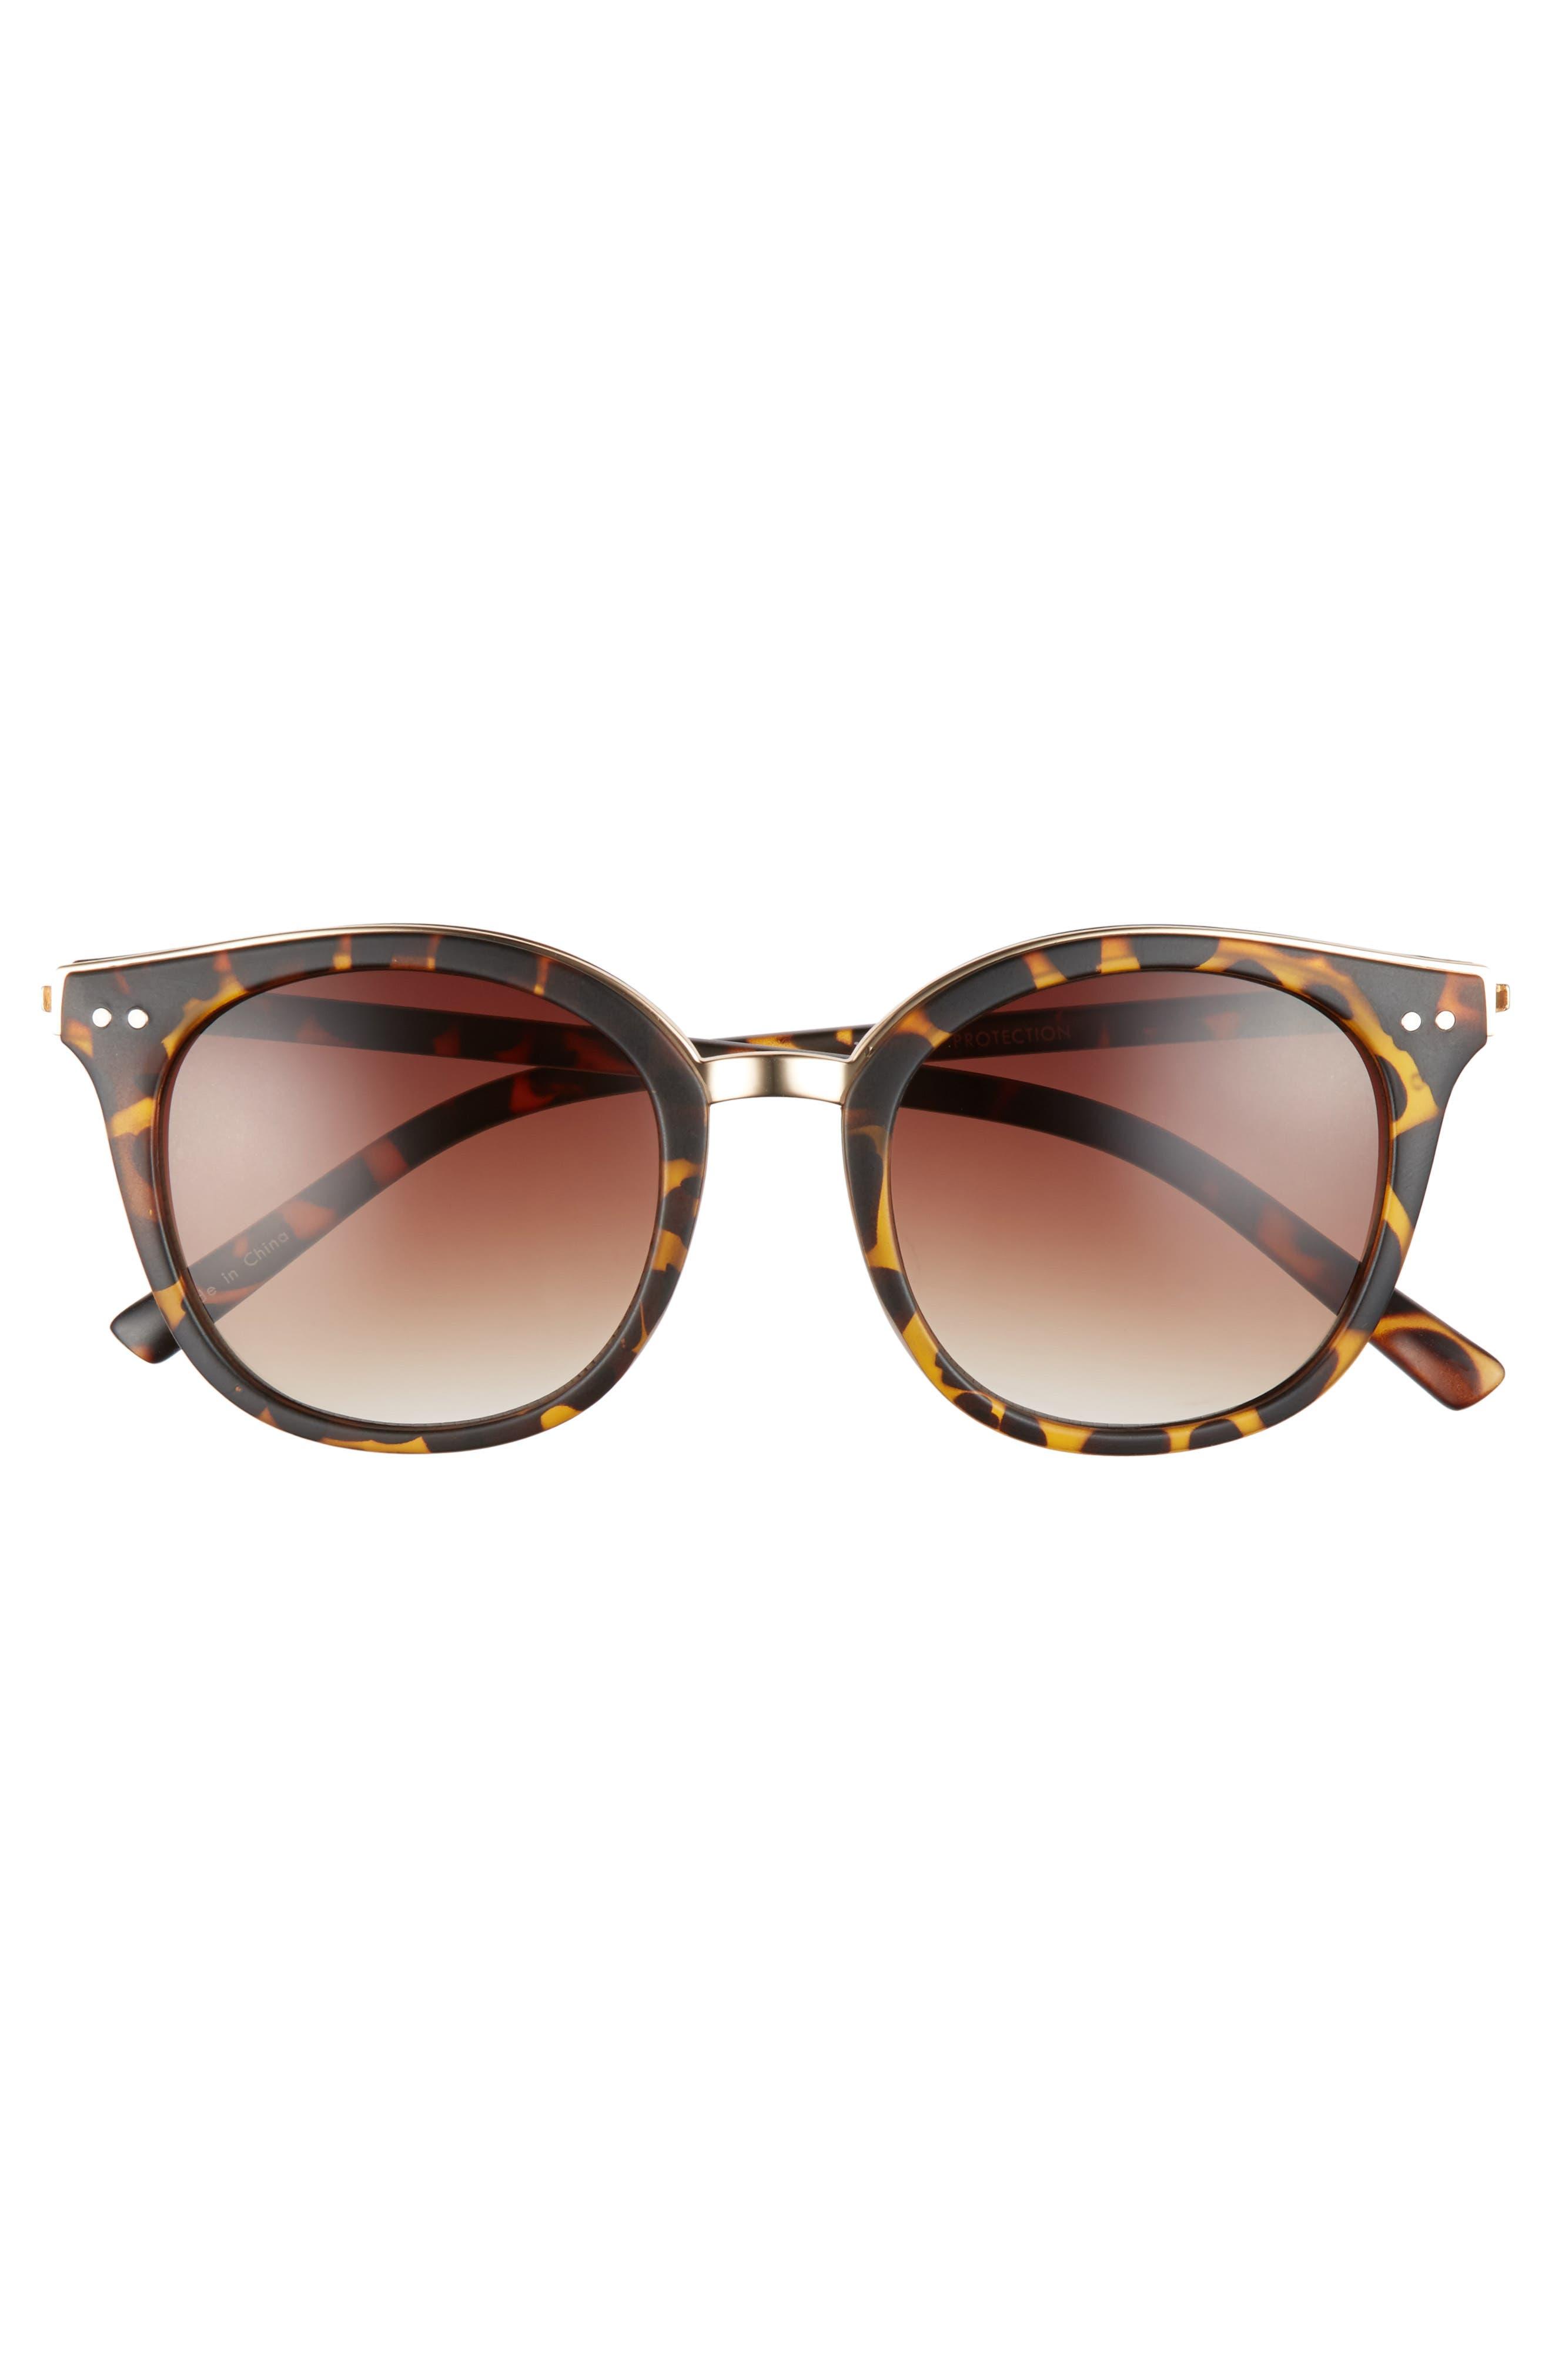 Metal Rim Round Sunglasses,                             Alternate thumbnail 3, color,                             200